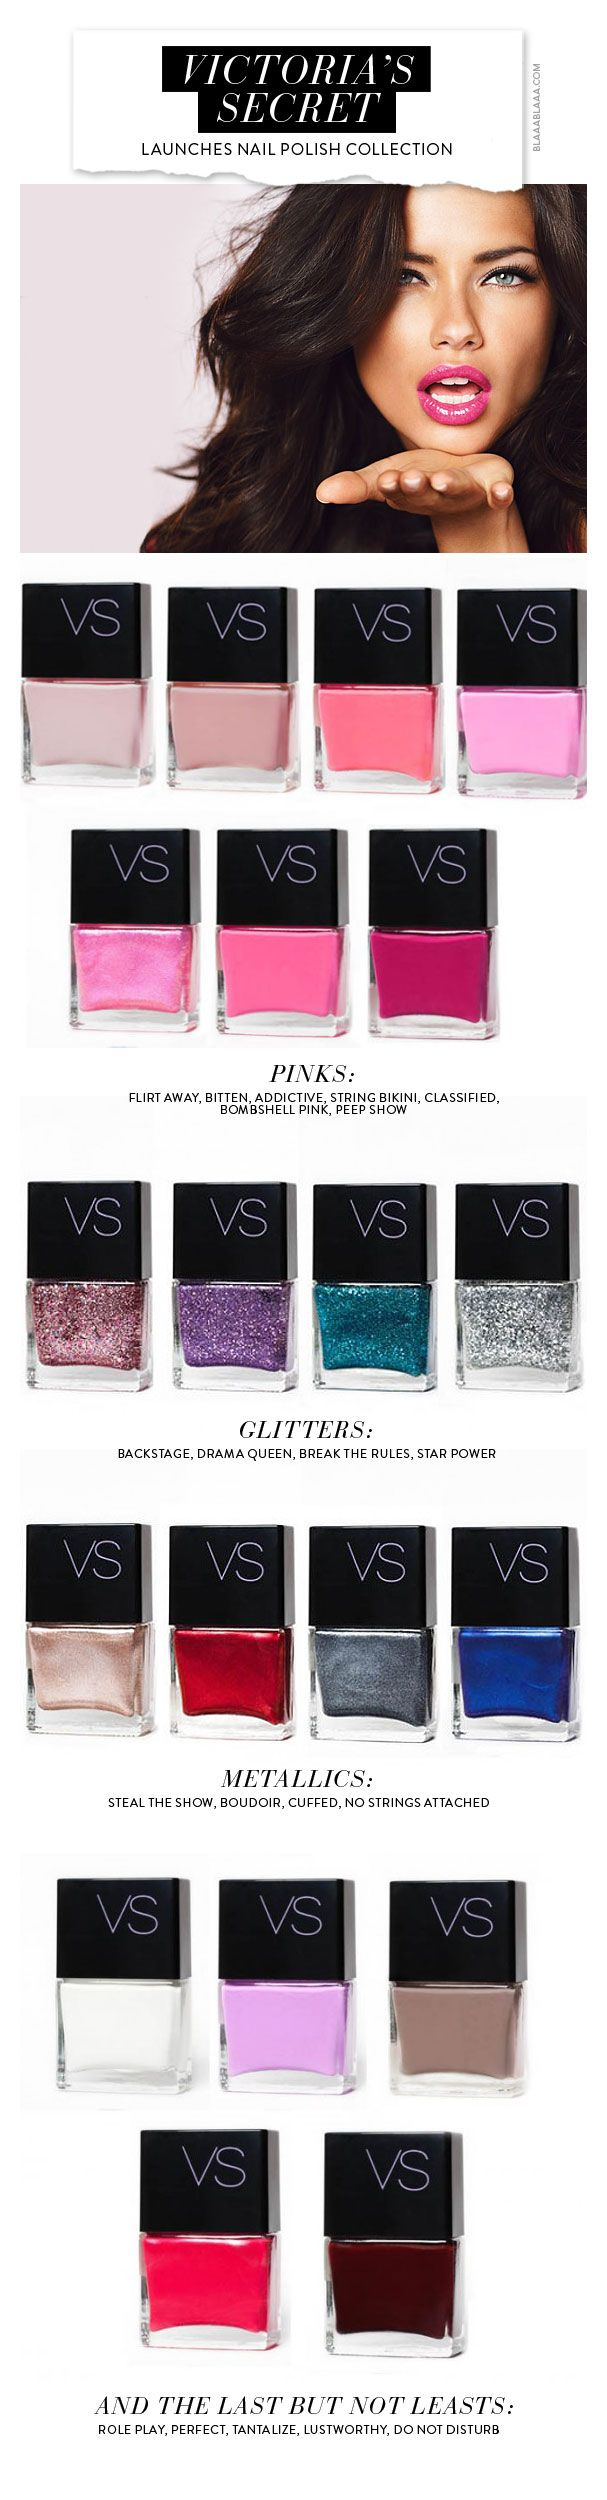 Victoria's Secret Launches Nail Polish Collection